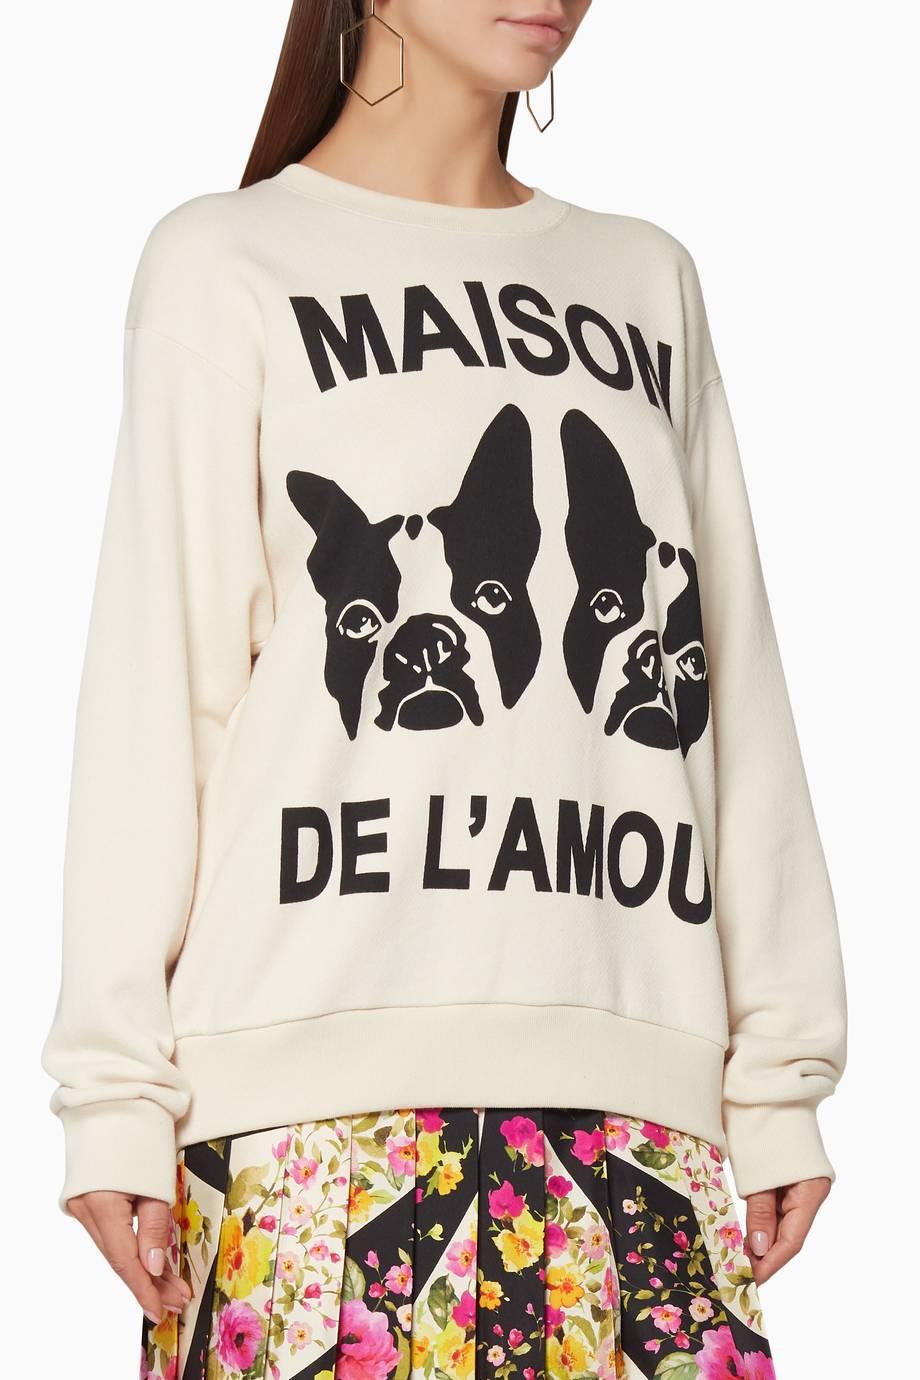 b30bcca6253 Shop Luxury Gucci Off-White Oversized Bosco   Orso Sweatshirt ...